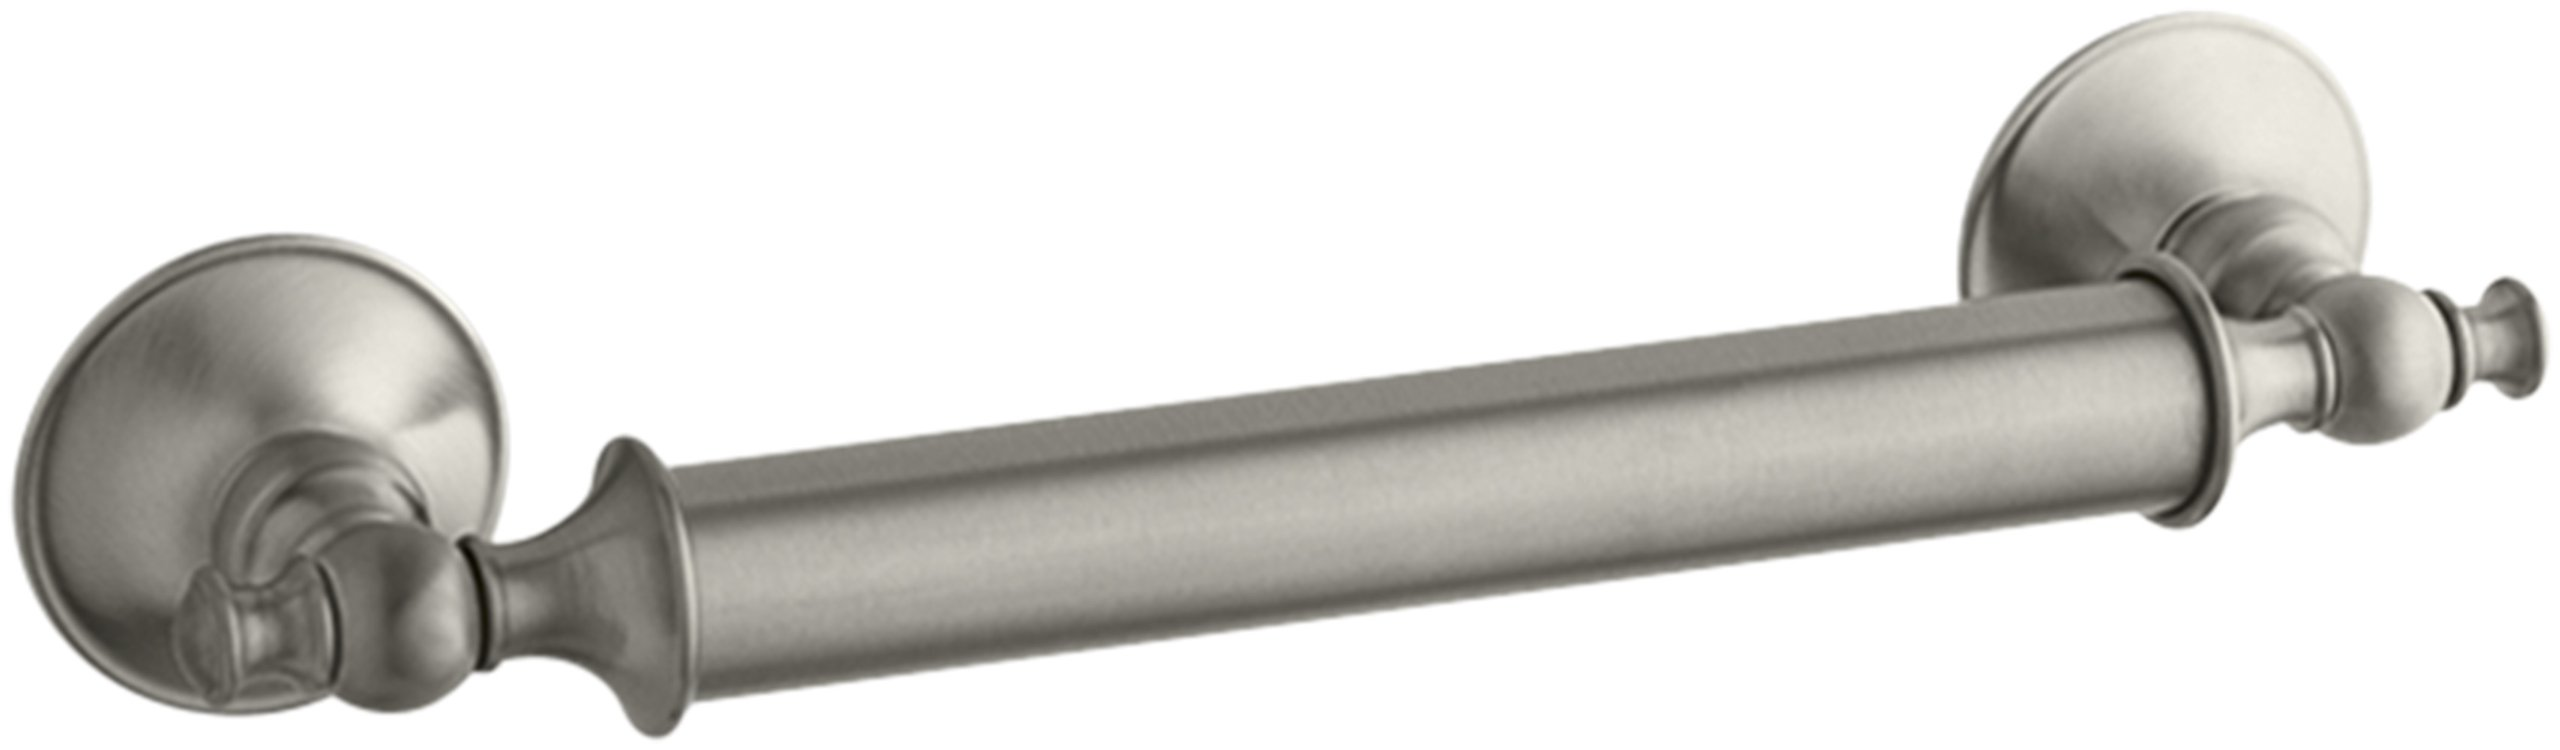 Kohler K-11871-BN Traditional 12'' Grab Bar, Vibrant Brushed Nickel